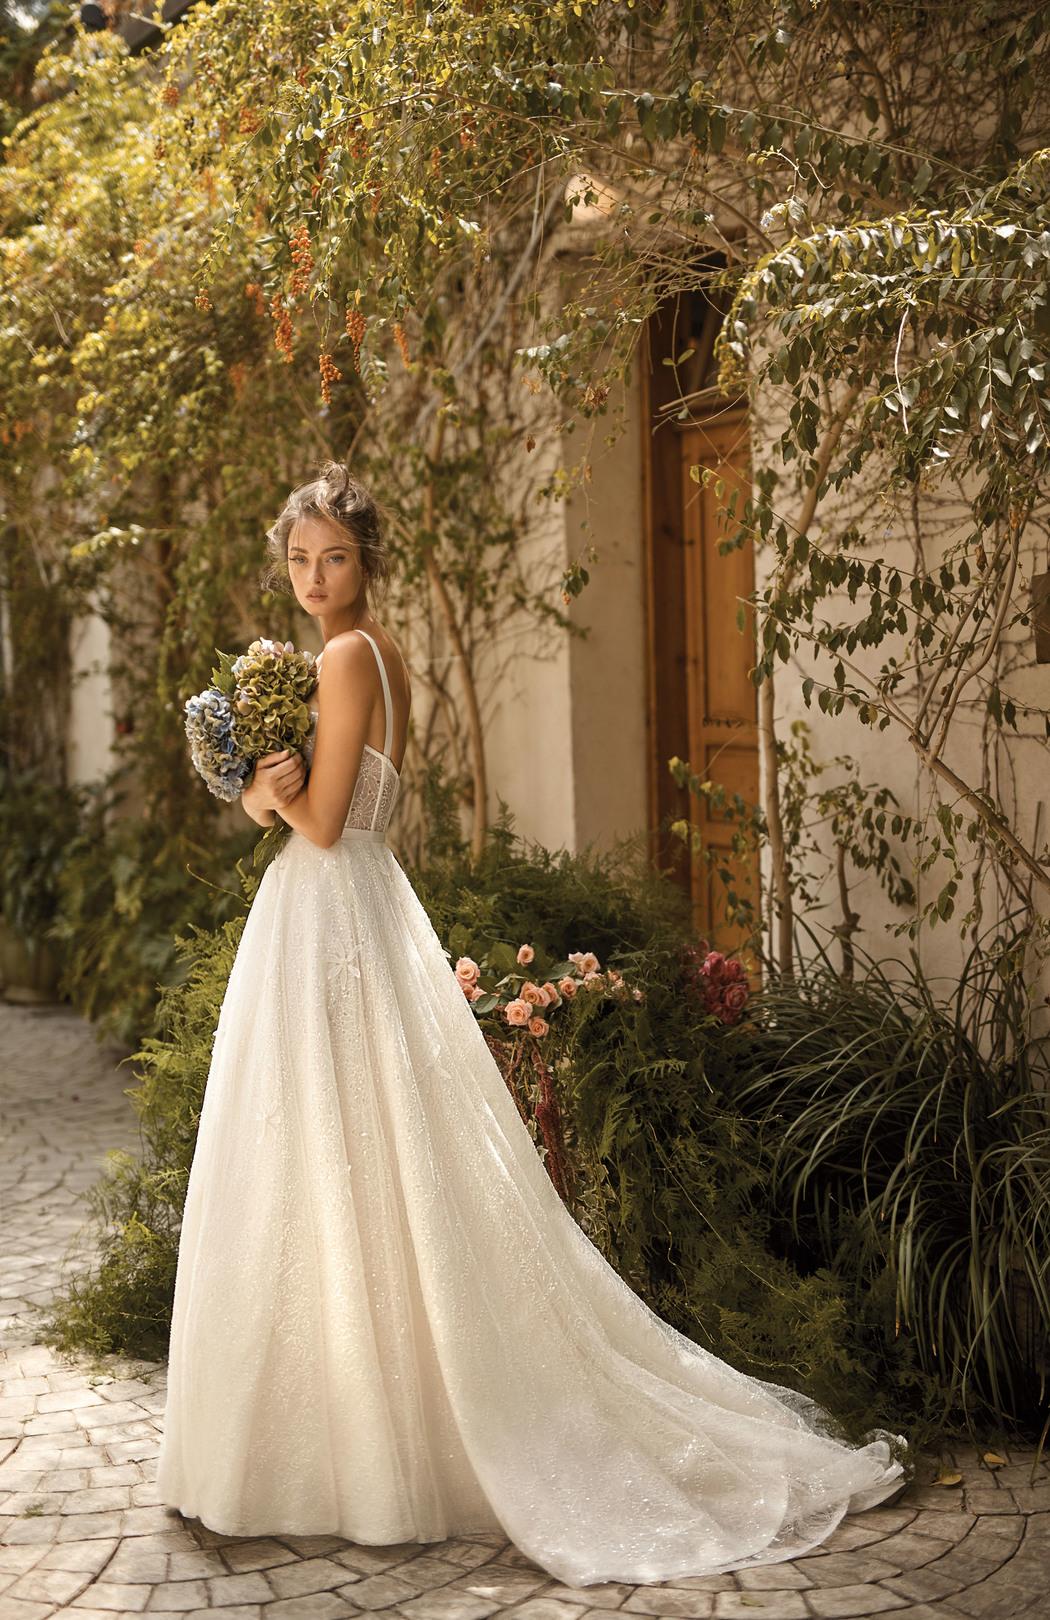 alma dress photo